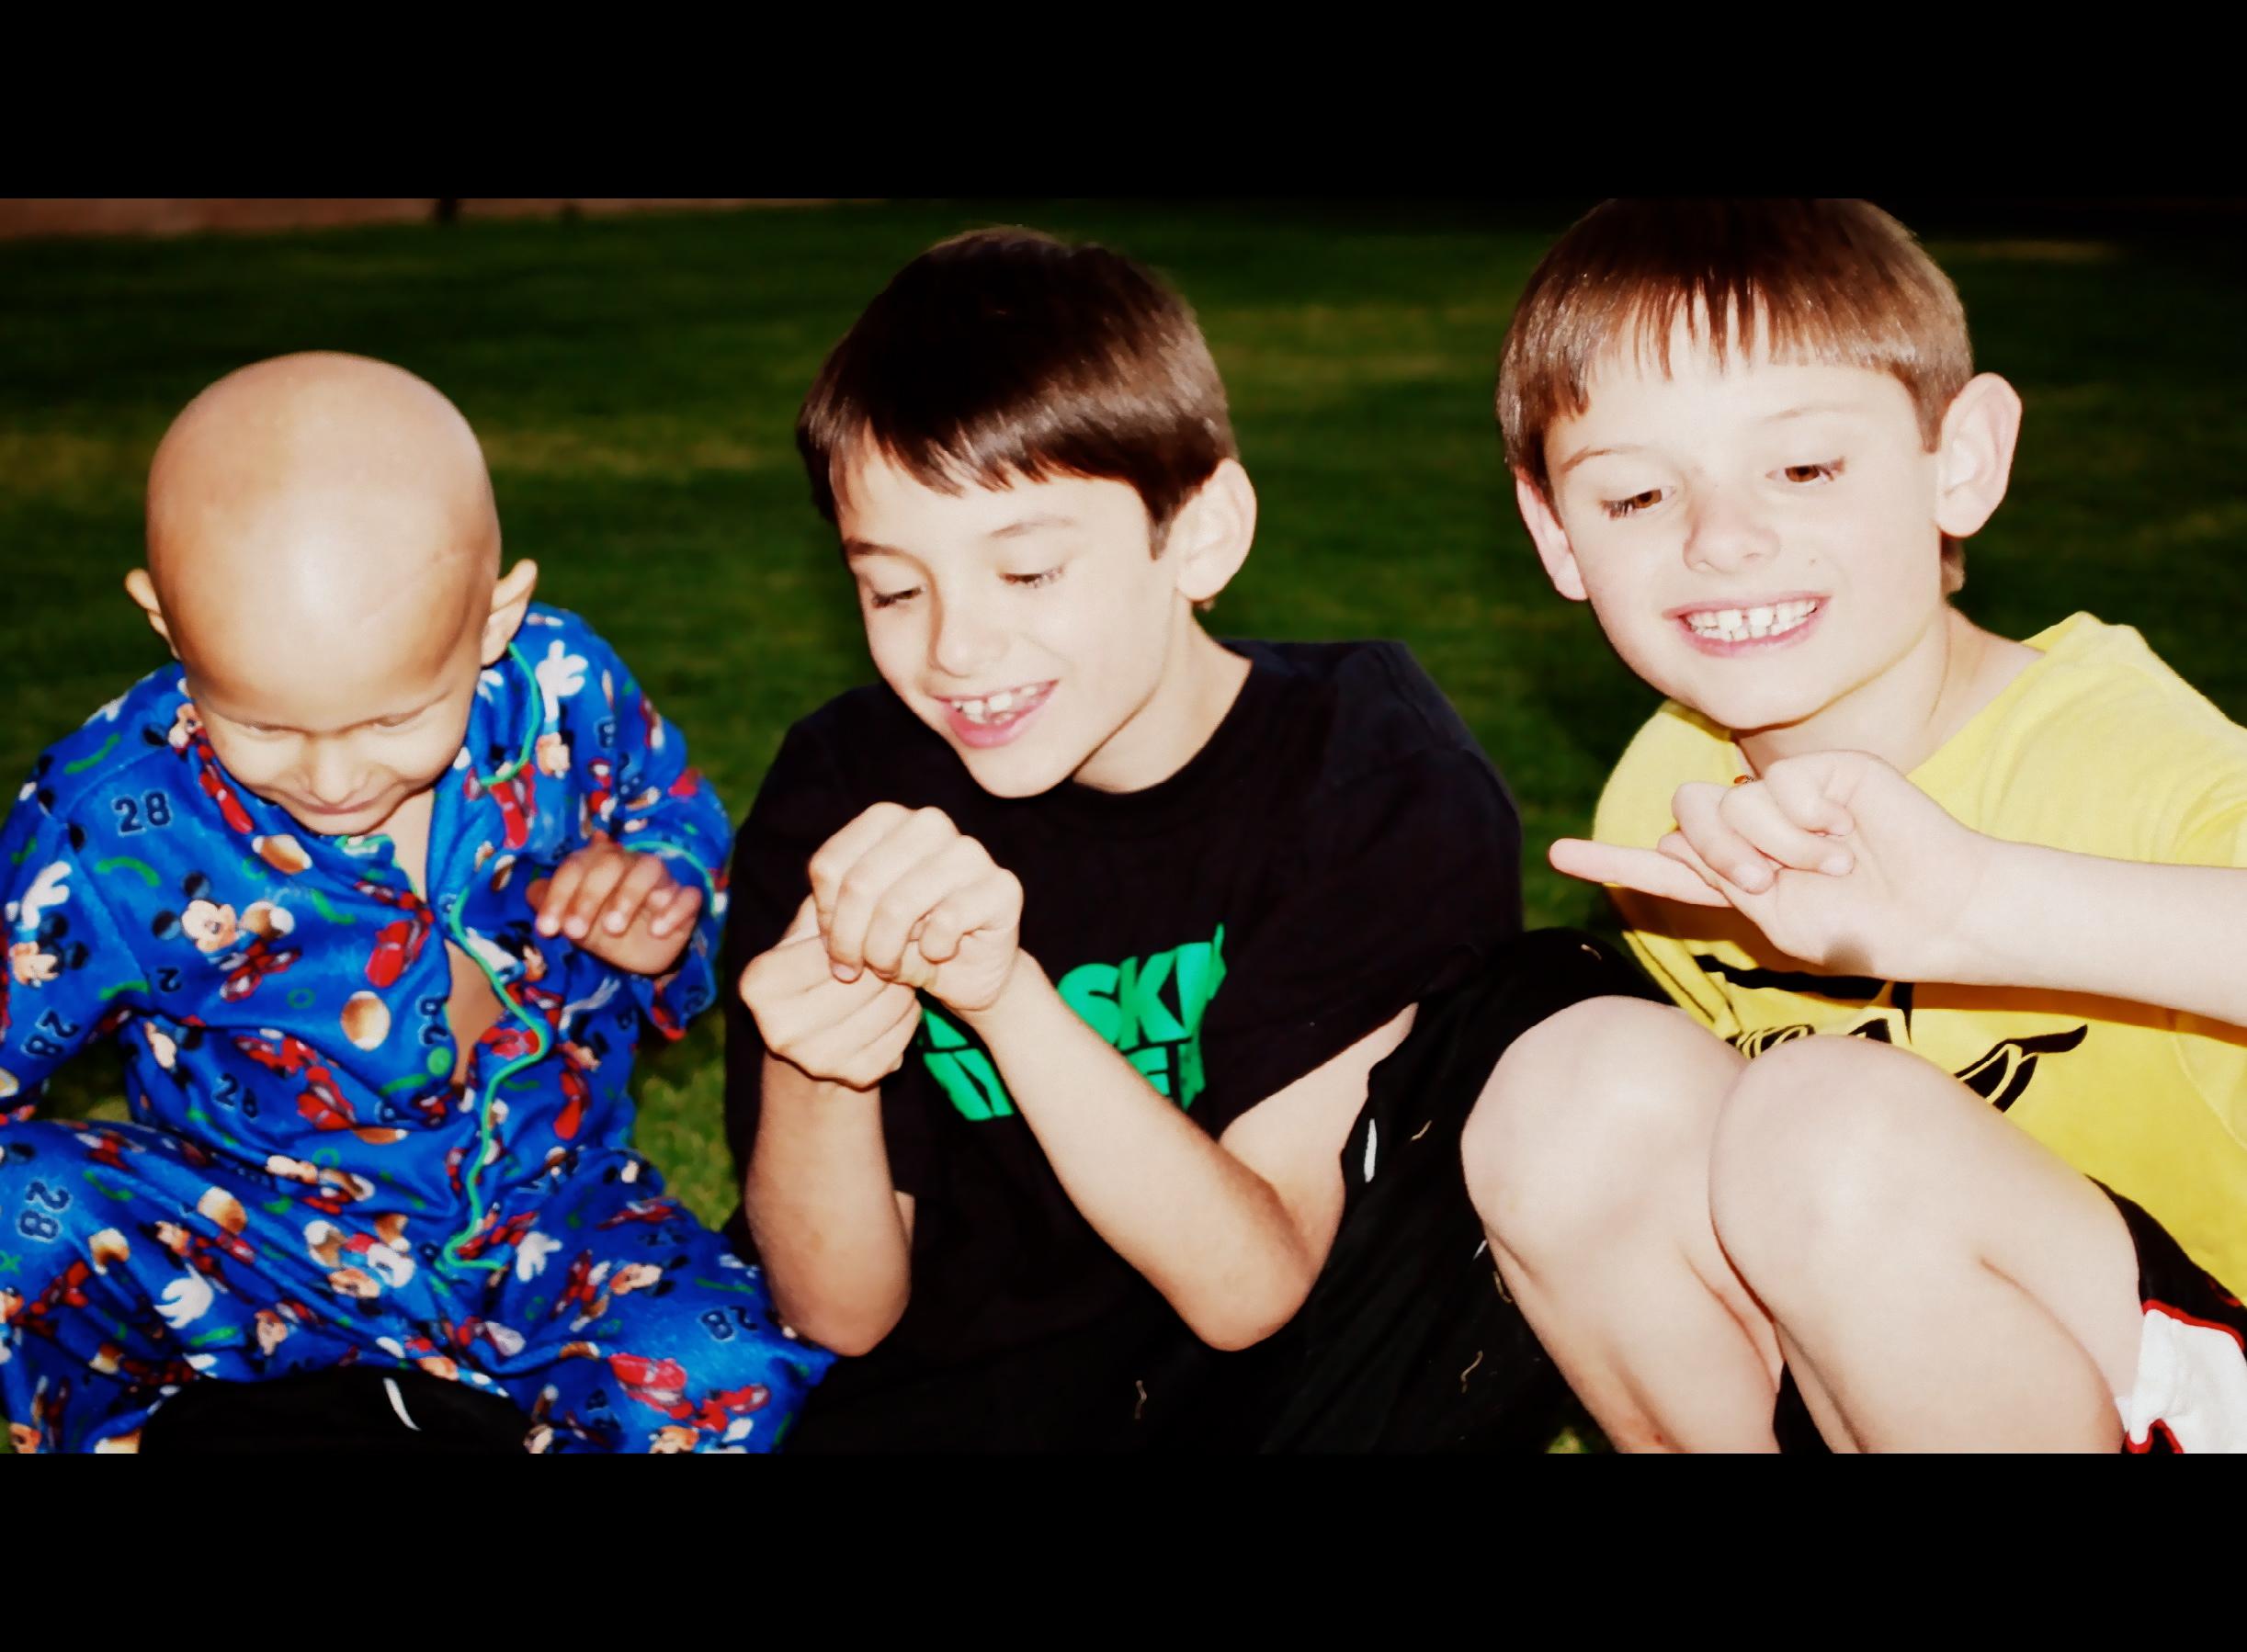 Brothers rockstar ronan for Tarbell family foundation